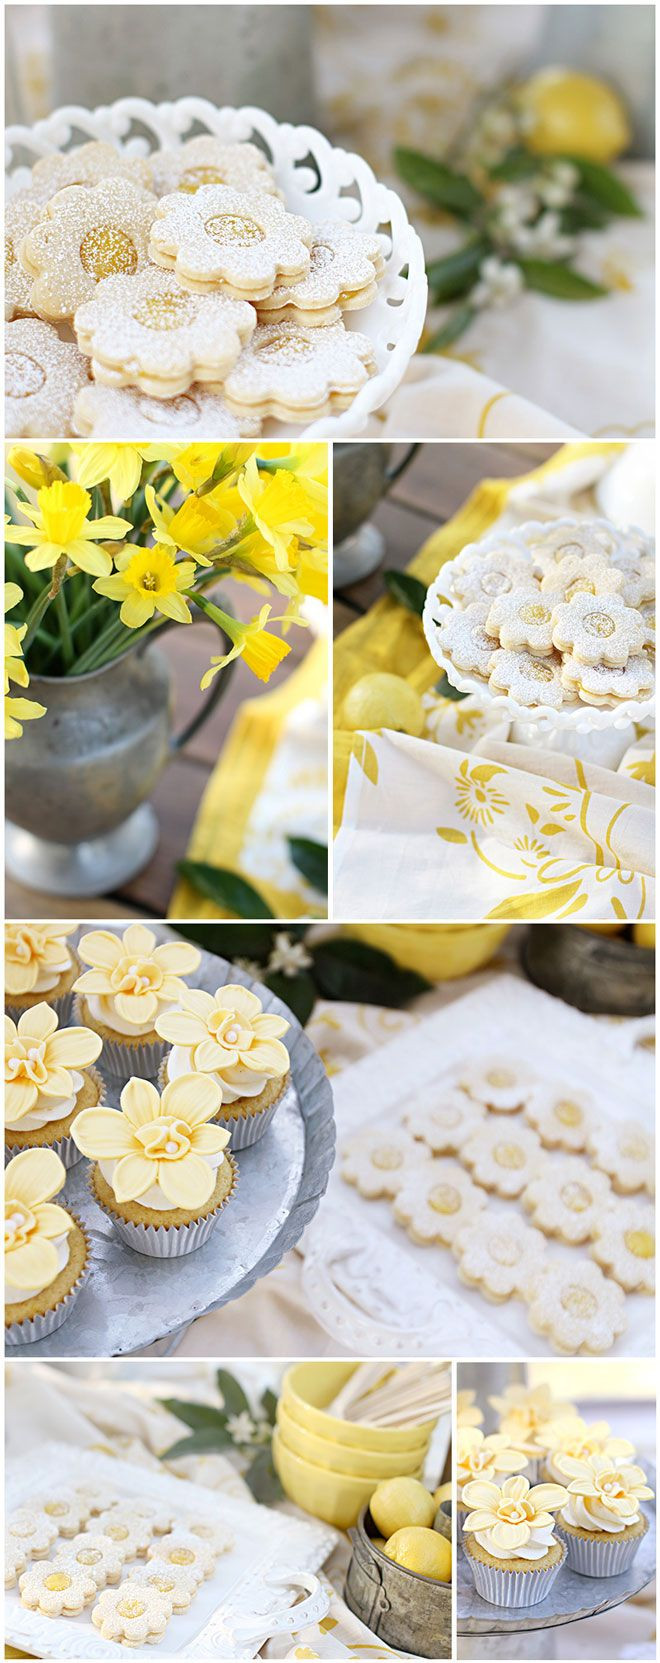 Lemon Easter Desserts  Best 25 Garden party foods ideas on Pinterest